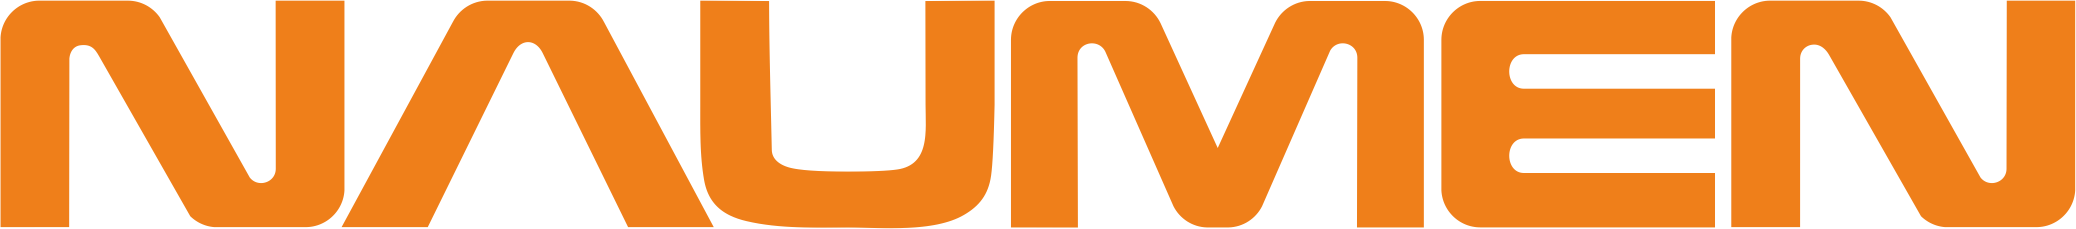 Naumen logo